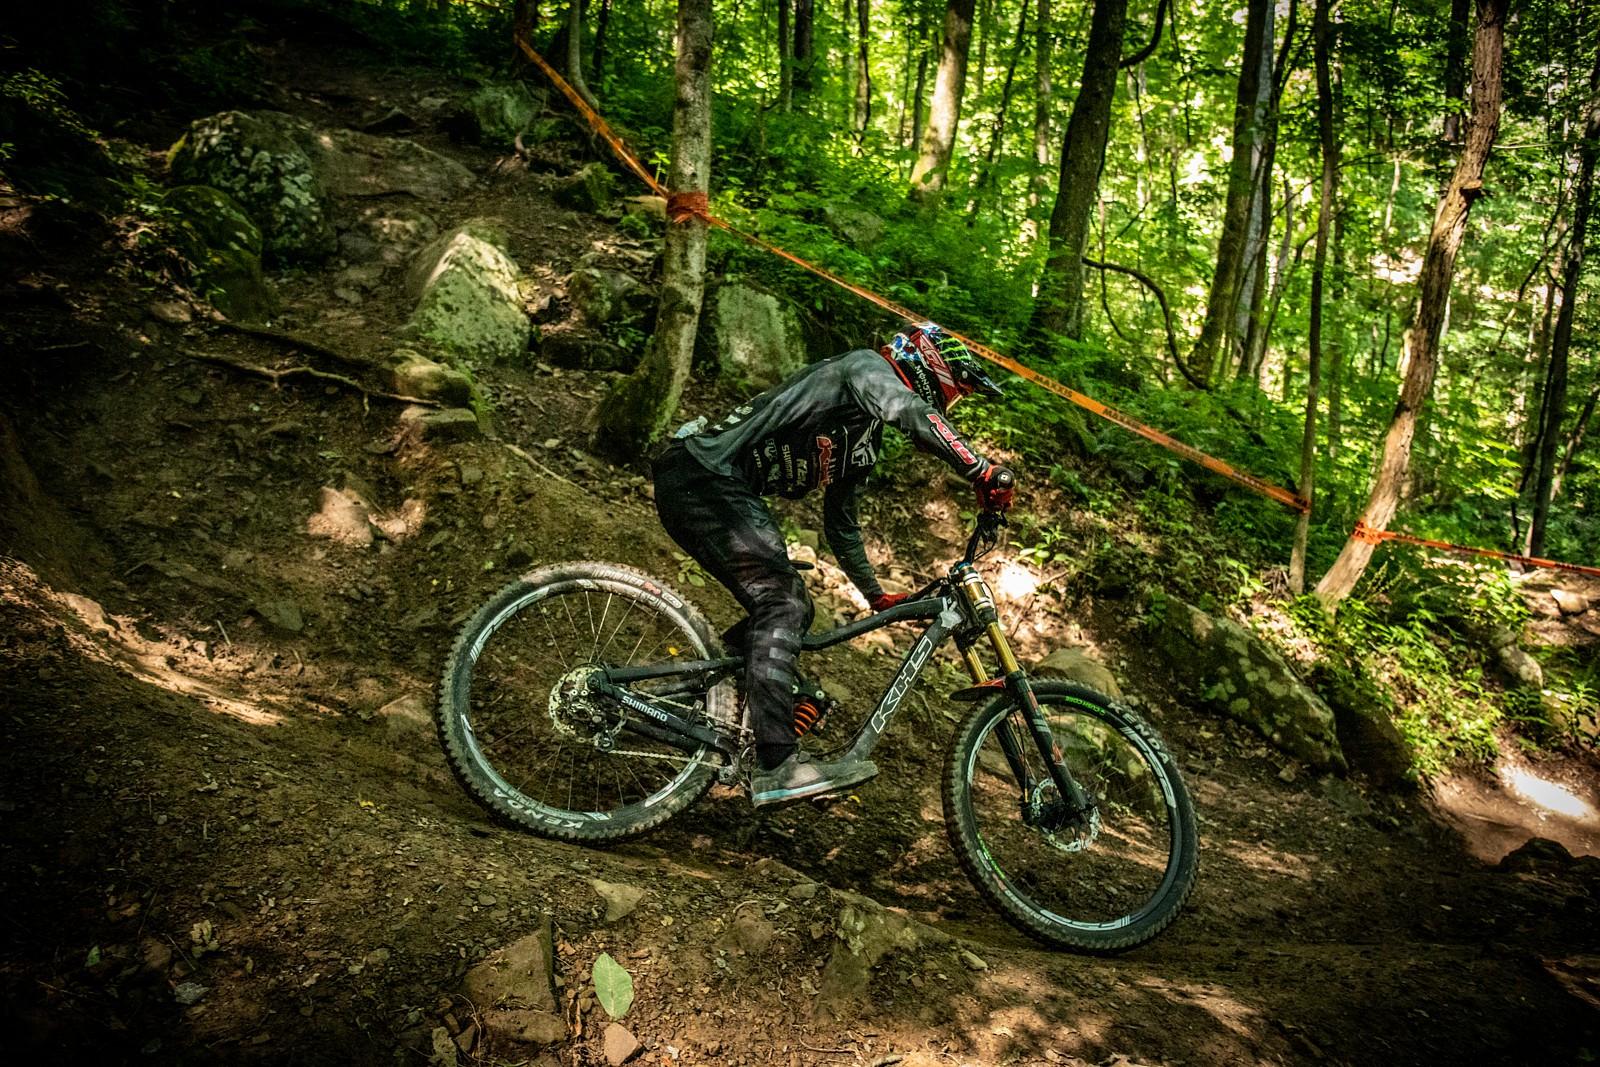 Nik Nestoroff - JackRice - Mountain Biking Pictures - Vital MTB